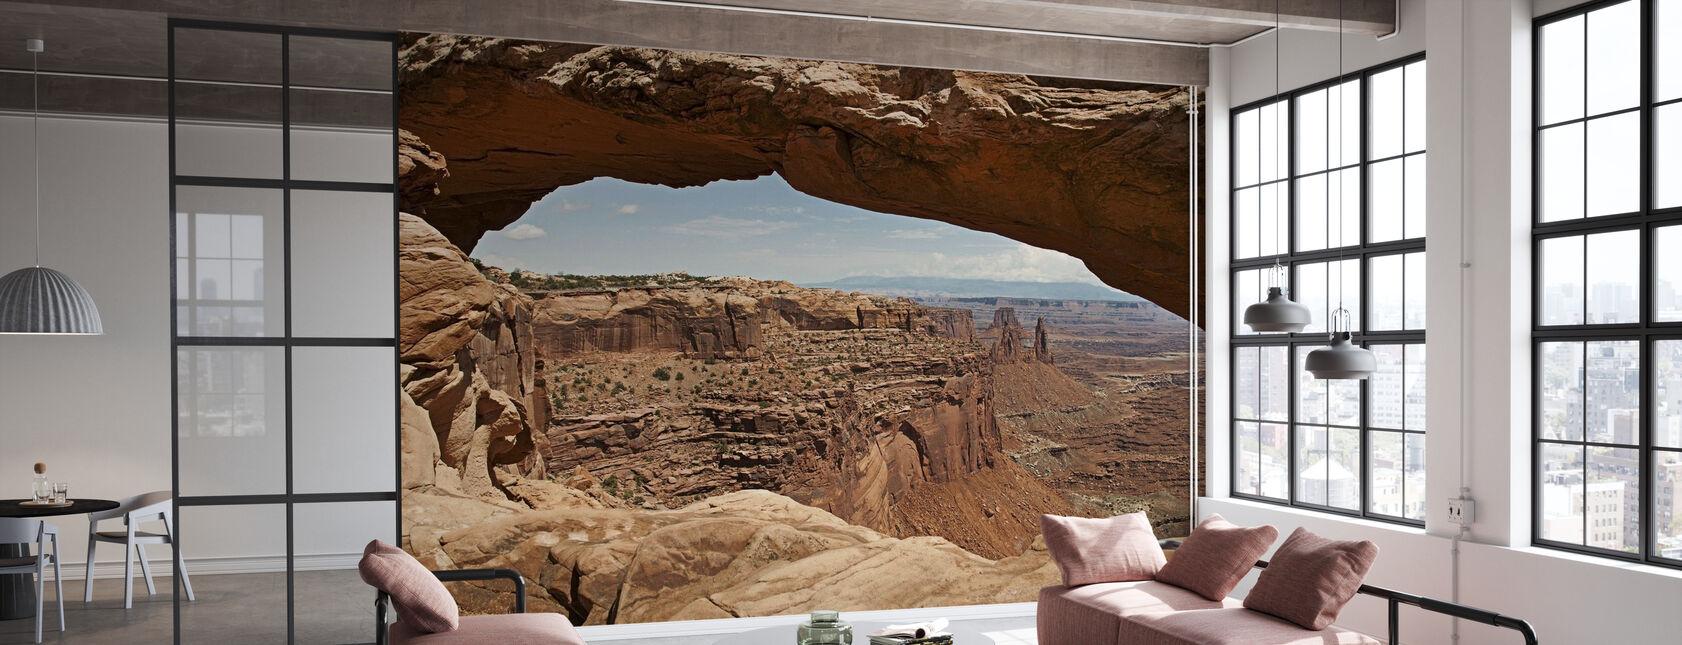 Mesa Arch - Behang - Kantoor